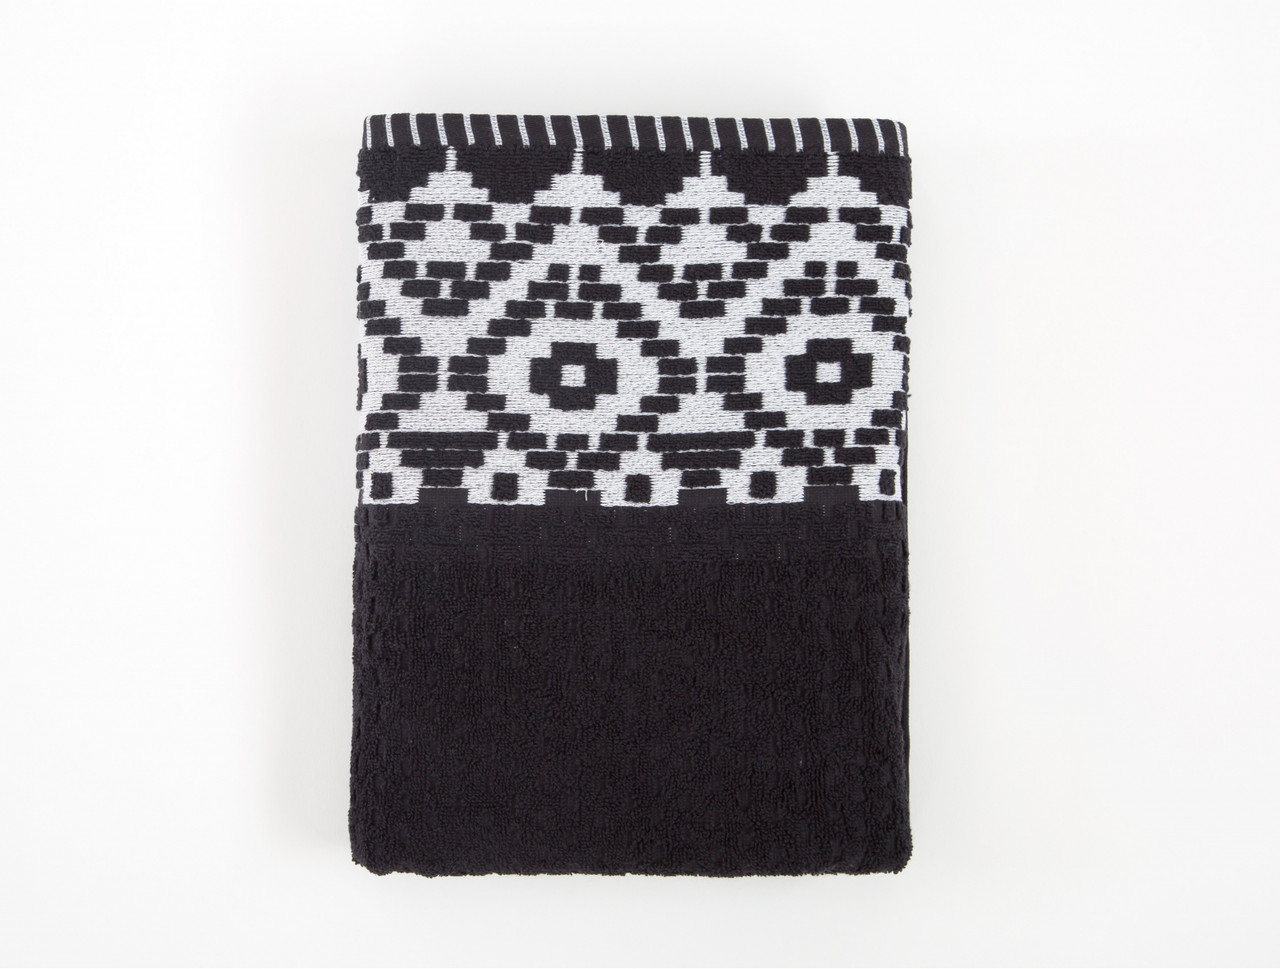 Полотенце Irya Jakarli - New Wall siyah черный 70*130